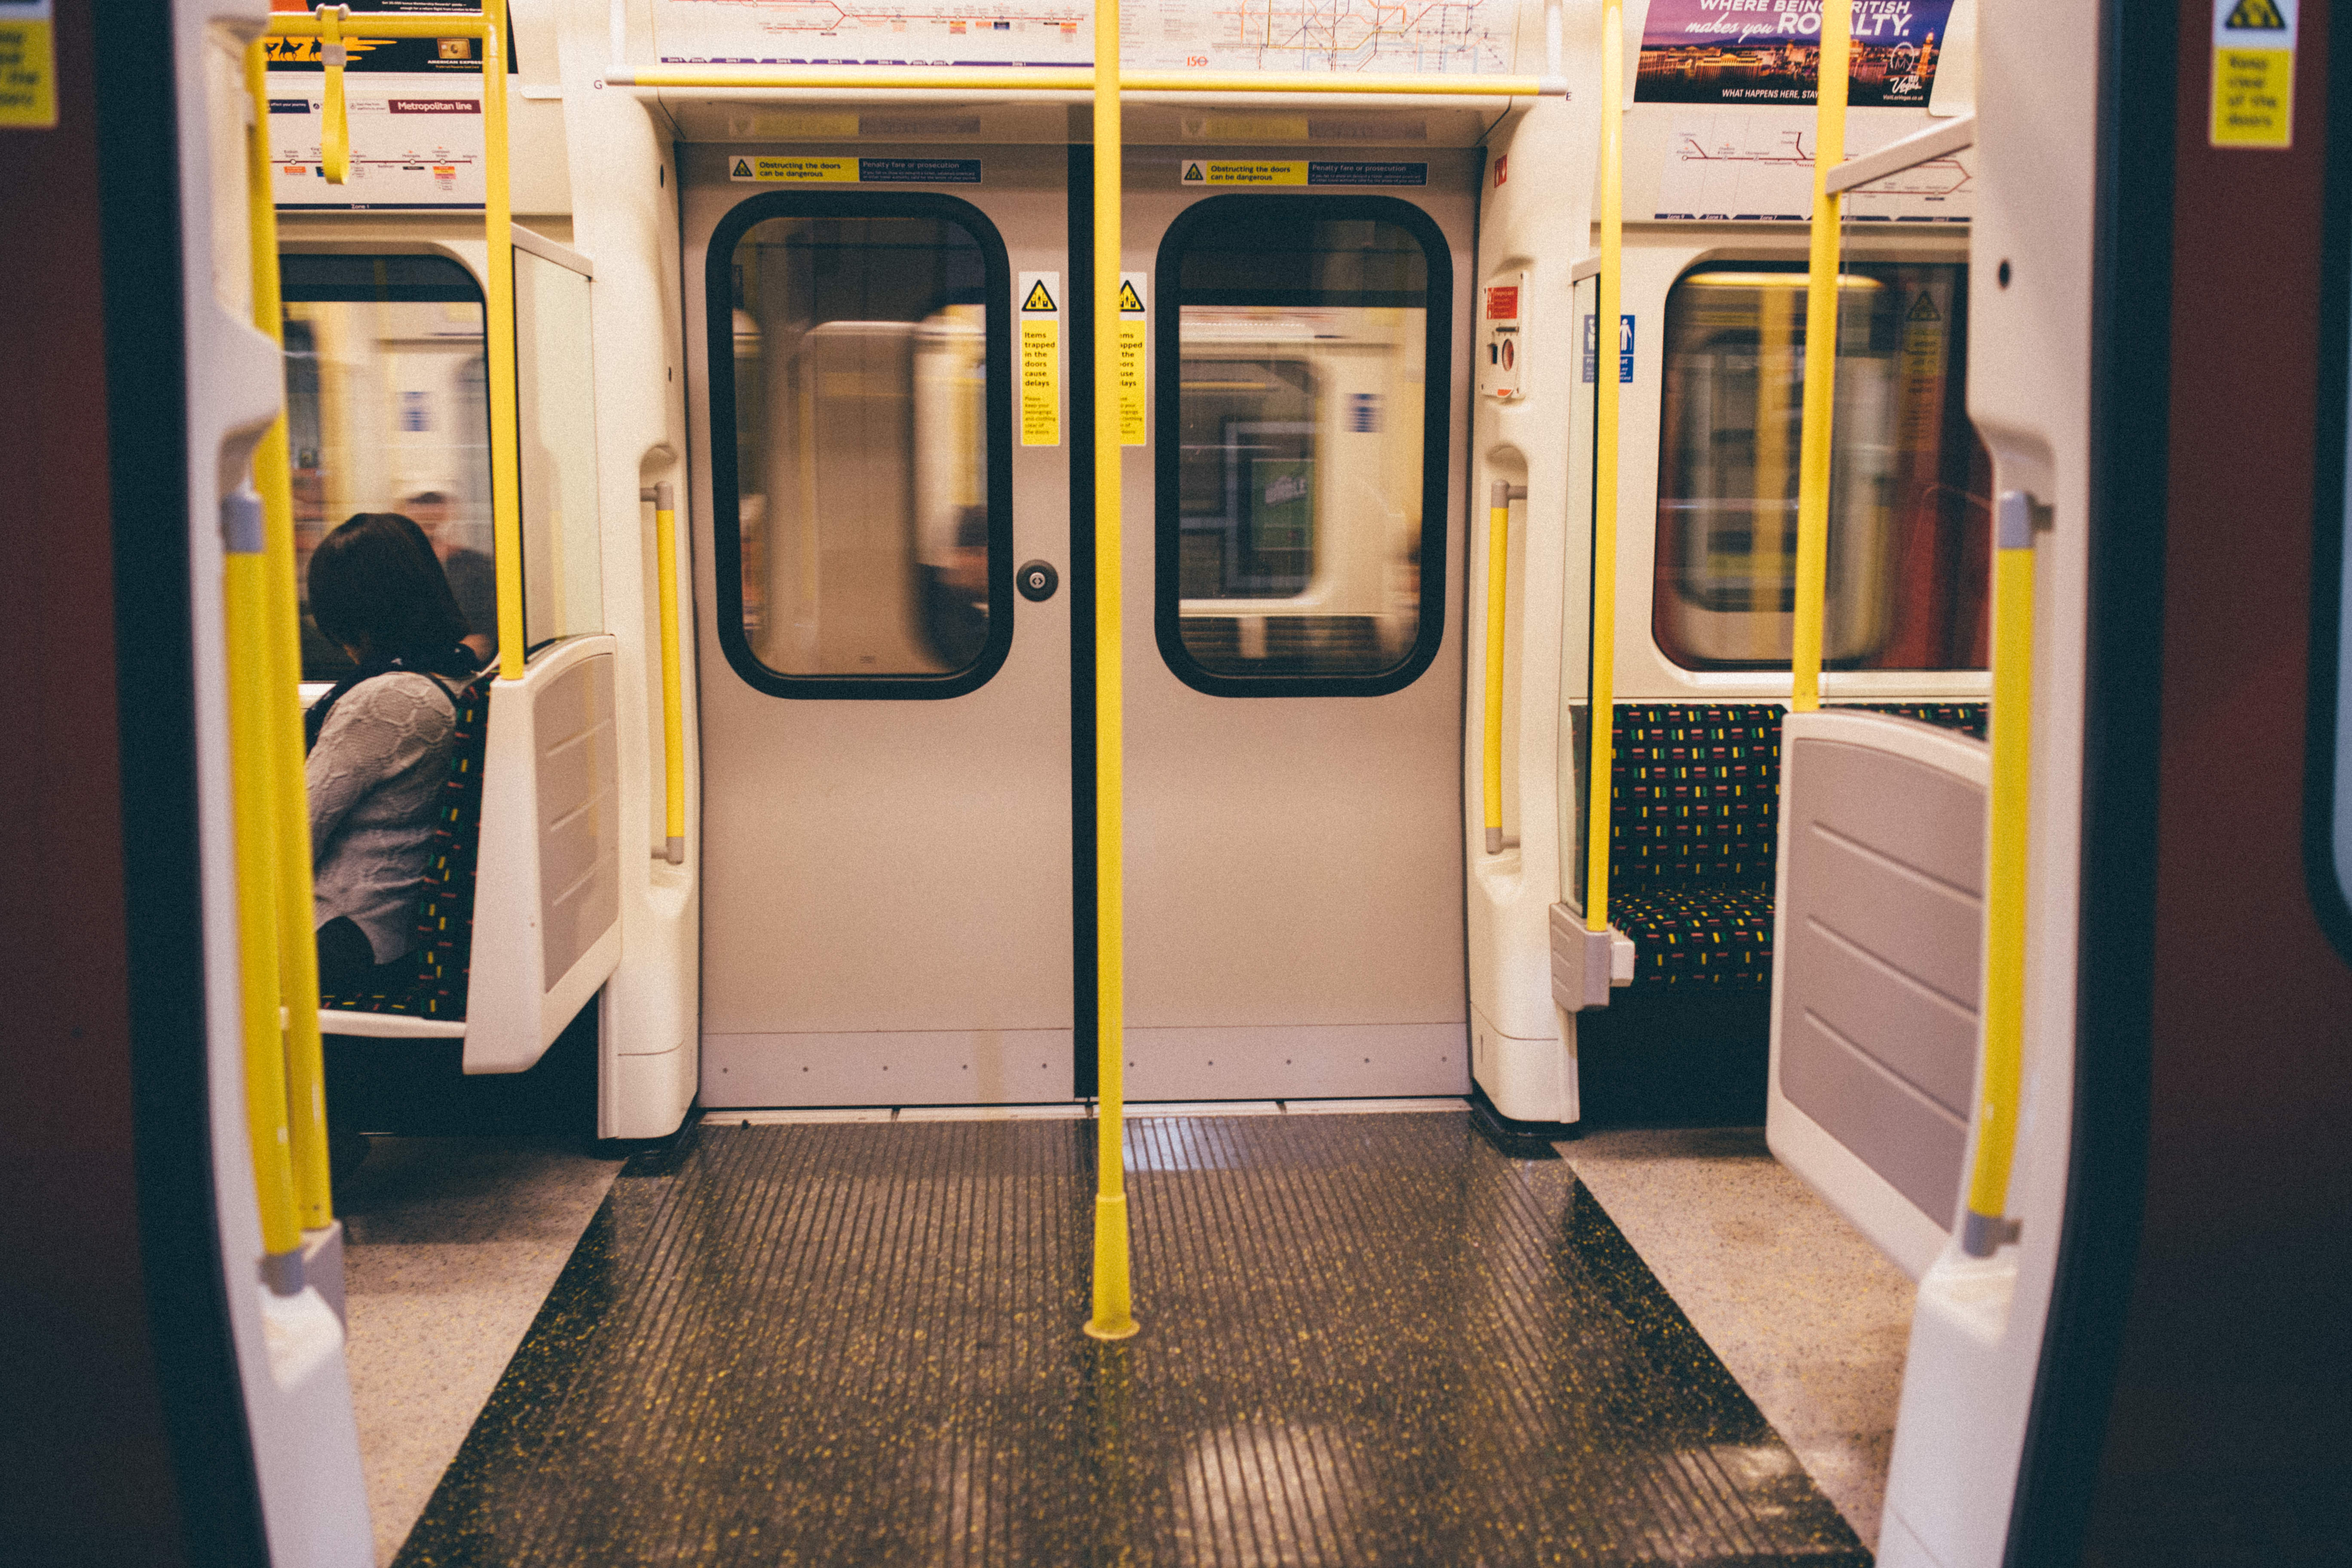 Train Travel, Travel, Travelling, Train, Subway, HQ Photo